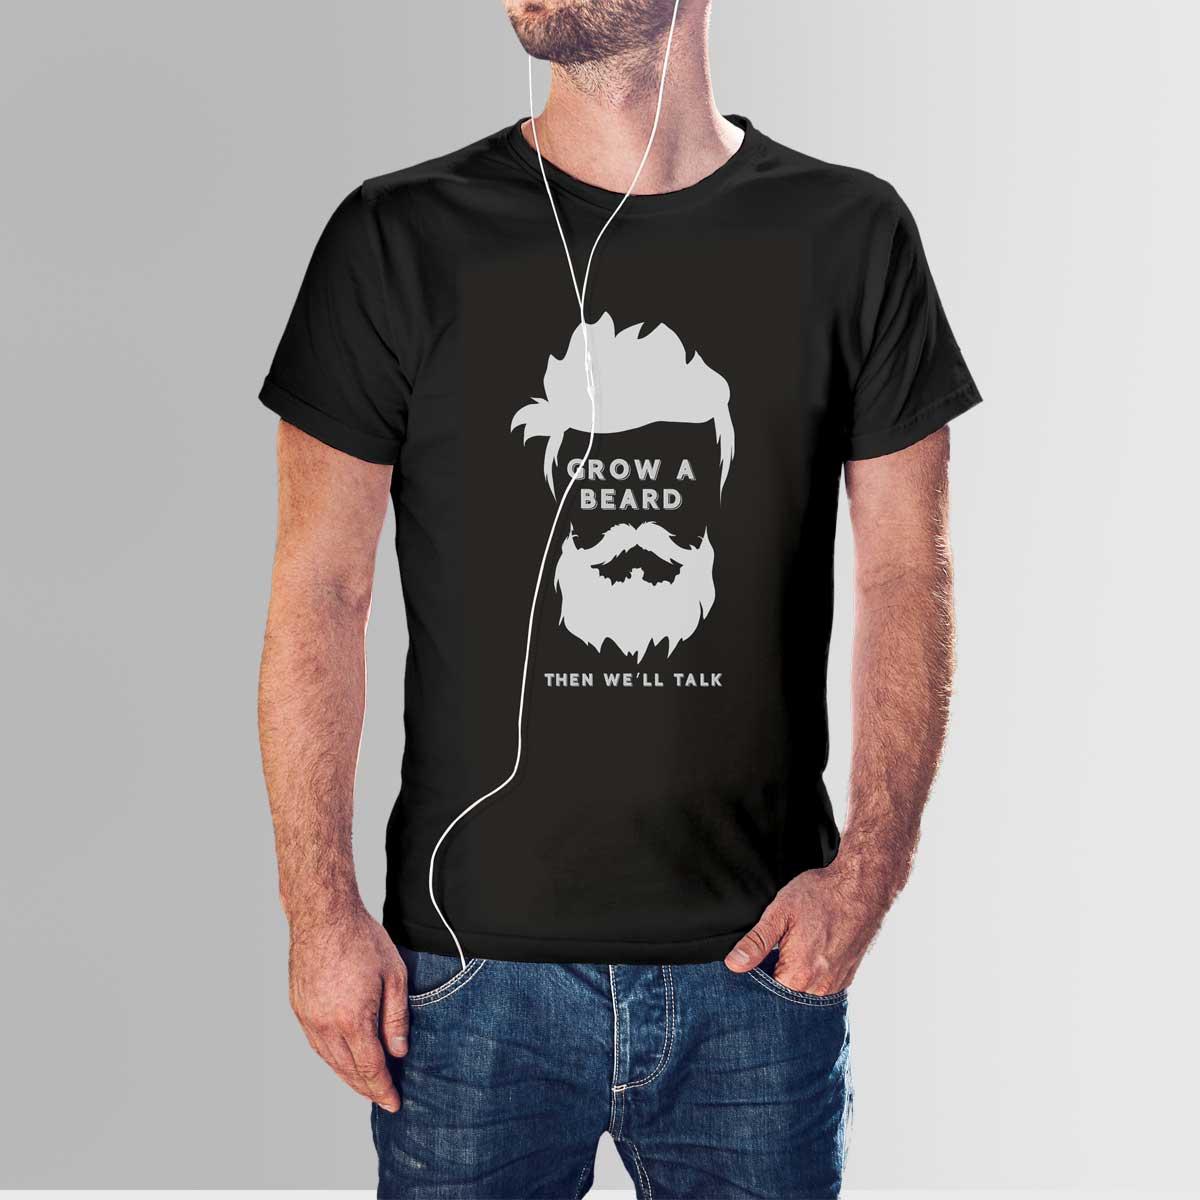 Beard T Shirt High Quality Cotton With Crew Neck Design